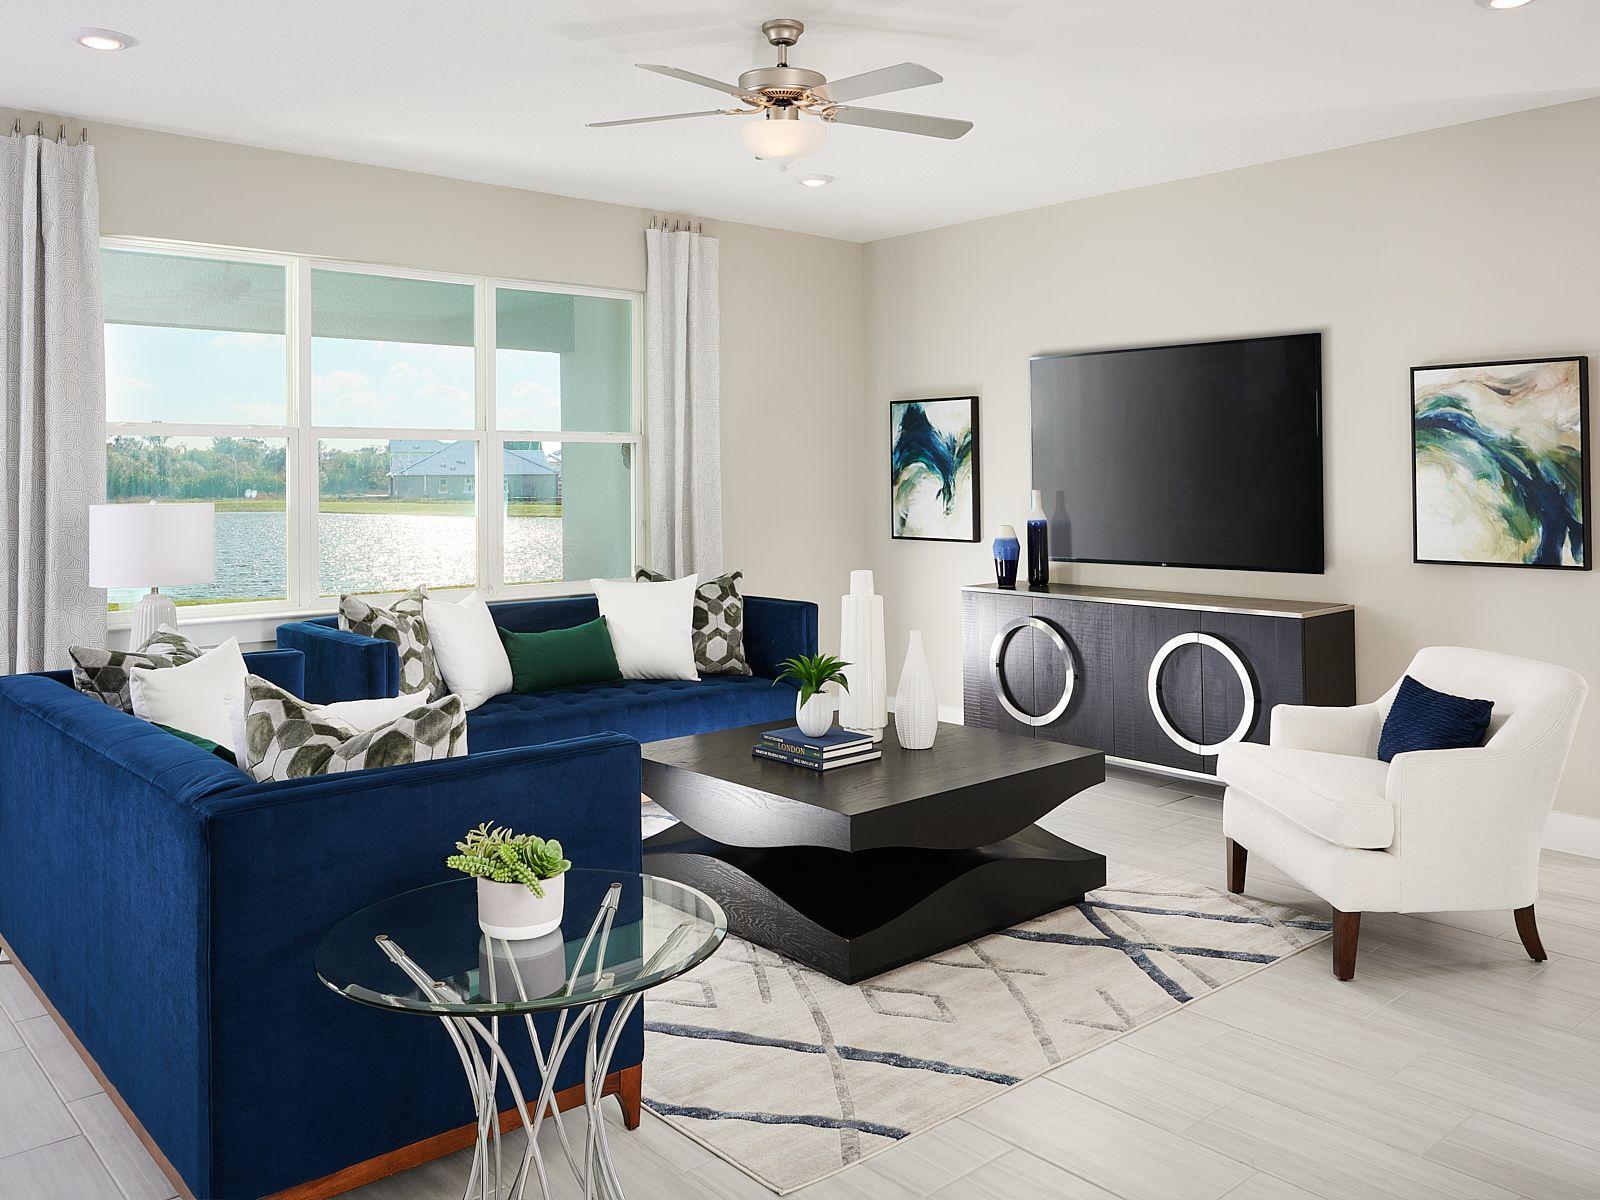 'Savanna at Lakewood Ranch - Signature Series' by Meritage Homes: Tampa, FL in Sarasota-Bradenton